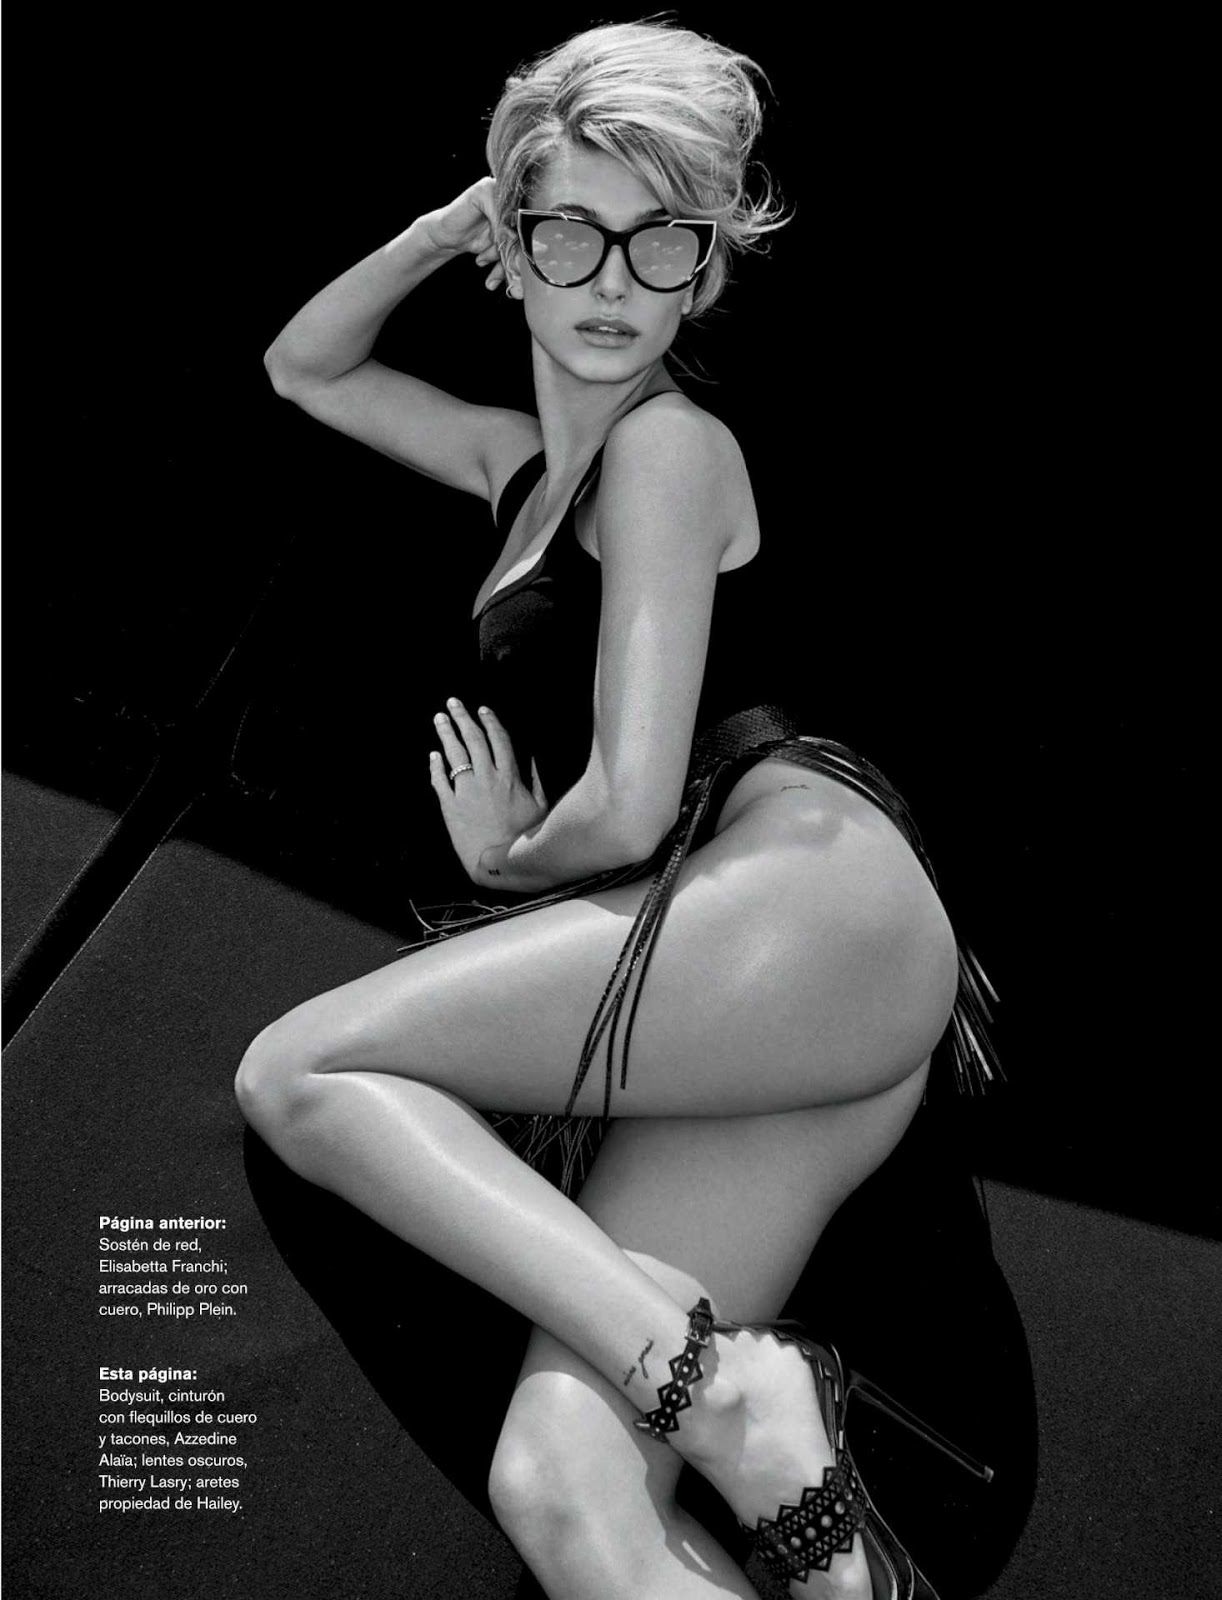 nude (75 photos), Paparazzi Celebrites foto